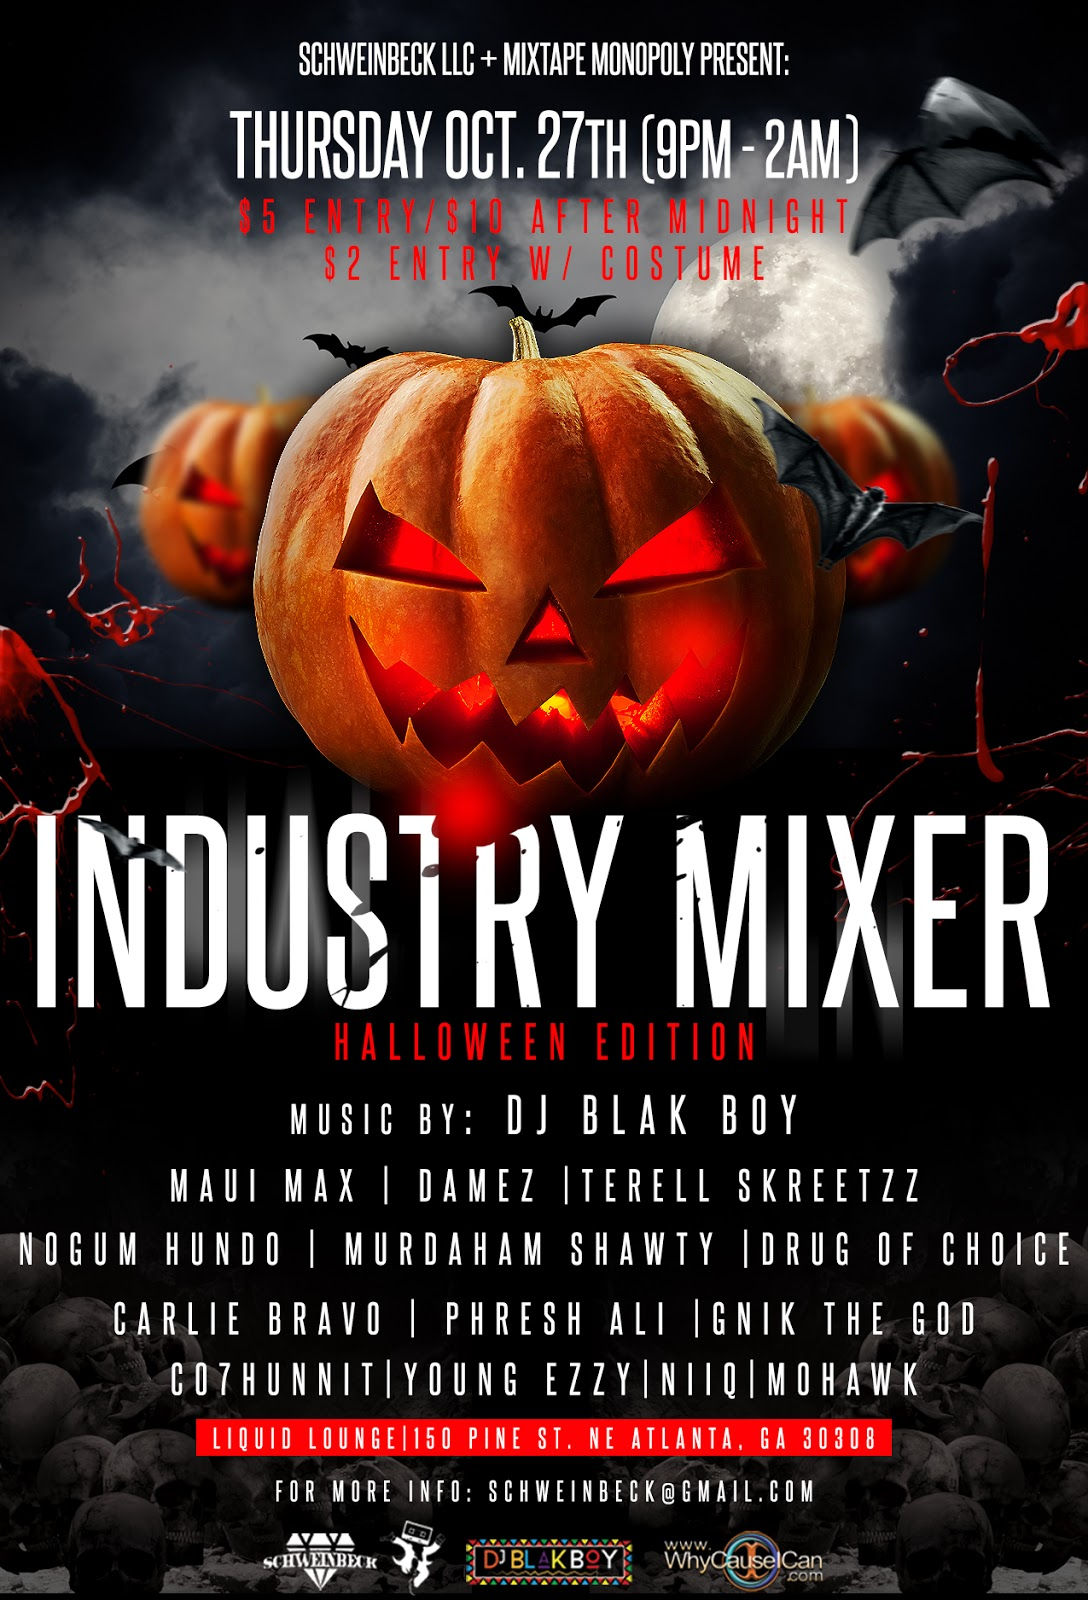 event//: schweinbeck llc + mixtape monopoly present: industry mixer